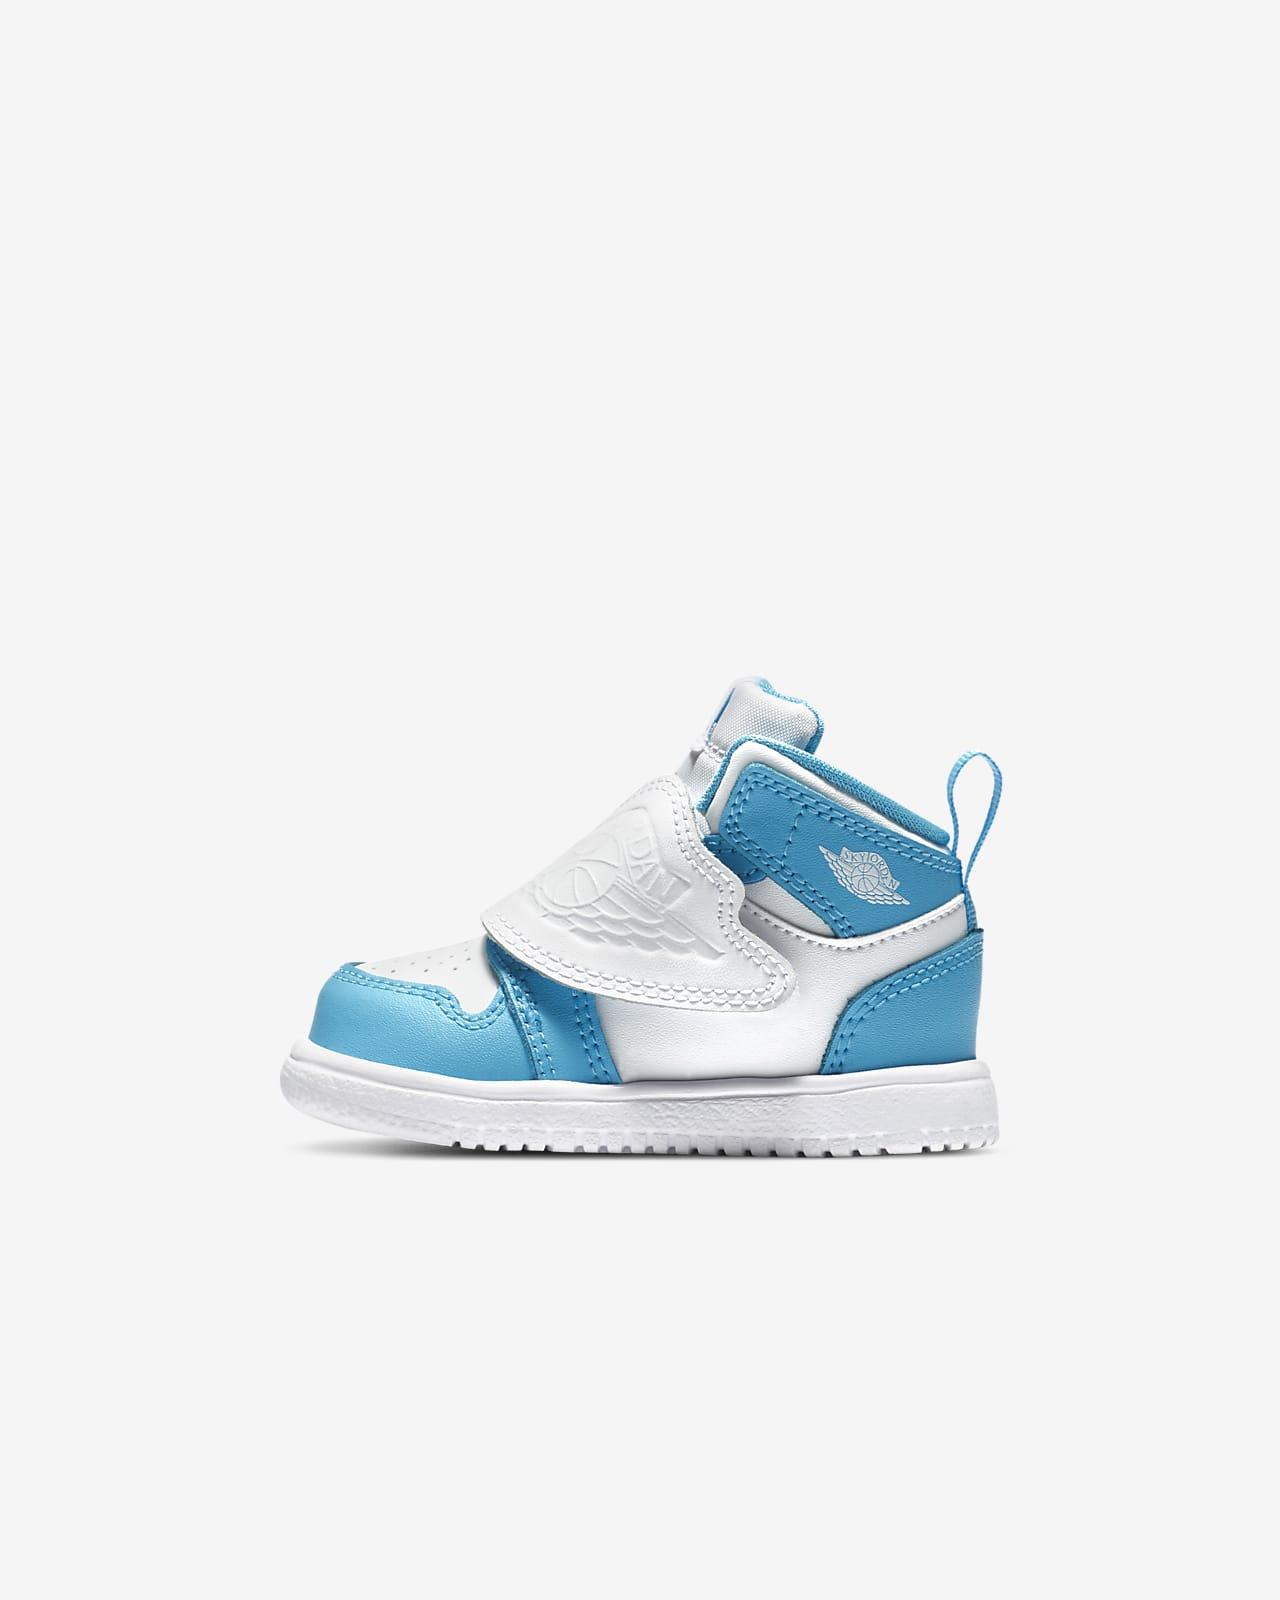 Sky Jordan 1 嬰幼兒鞋款